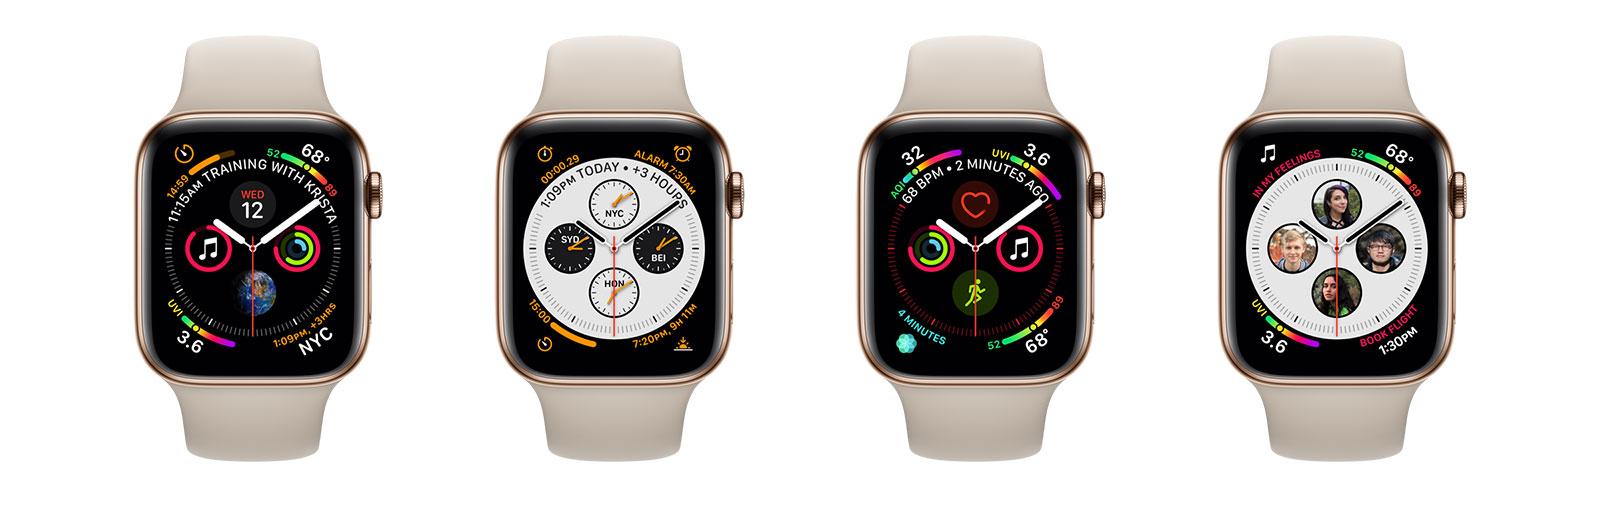 Apple Watch Series 4, 2018